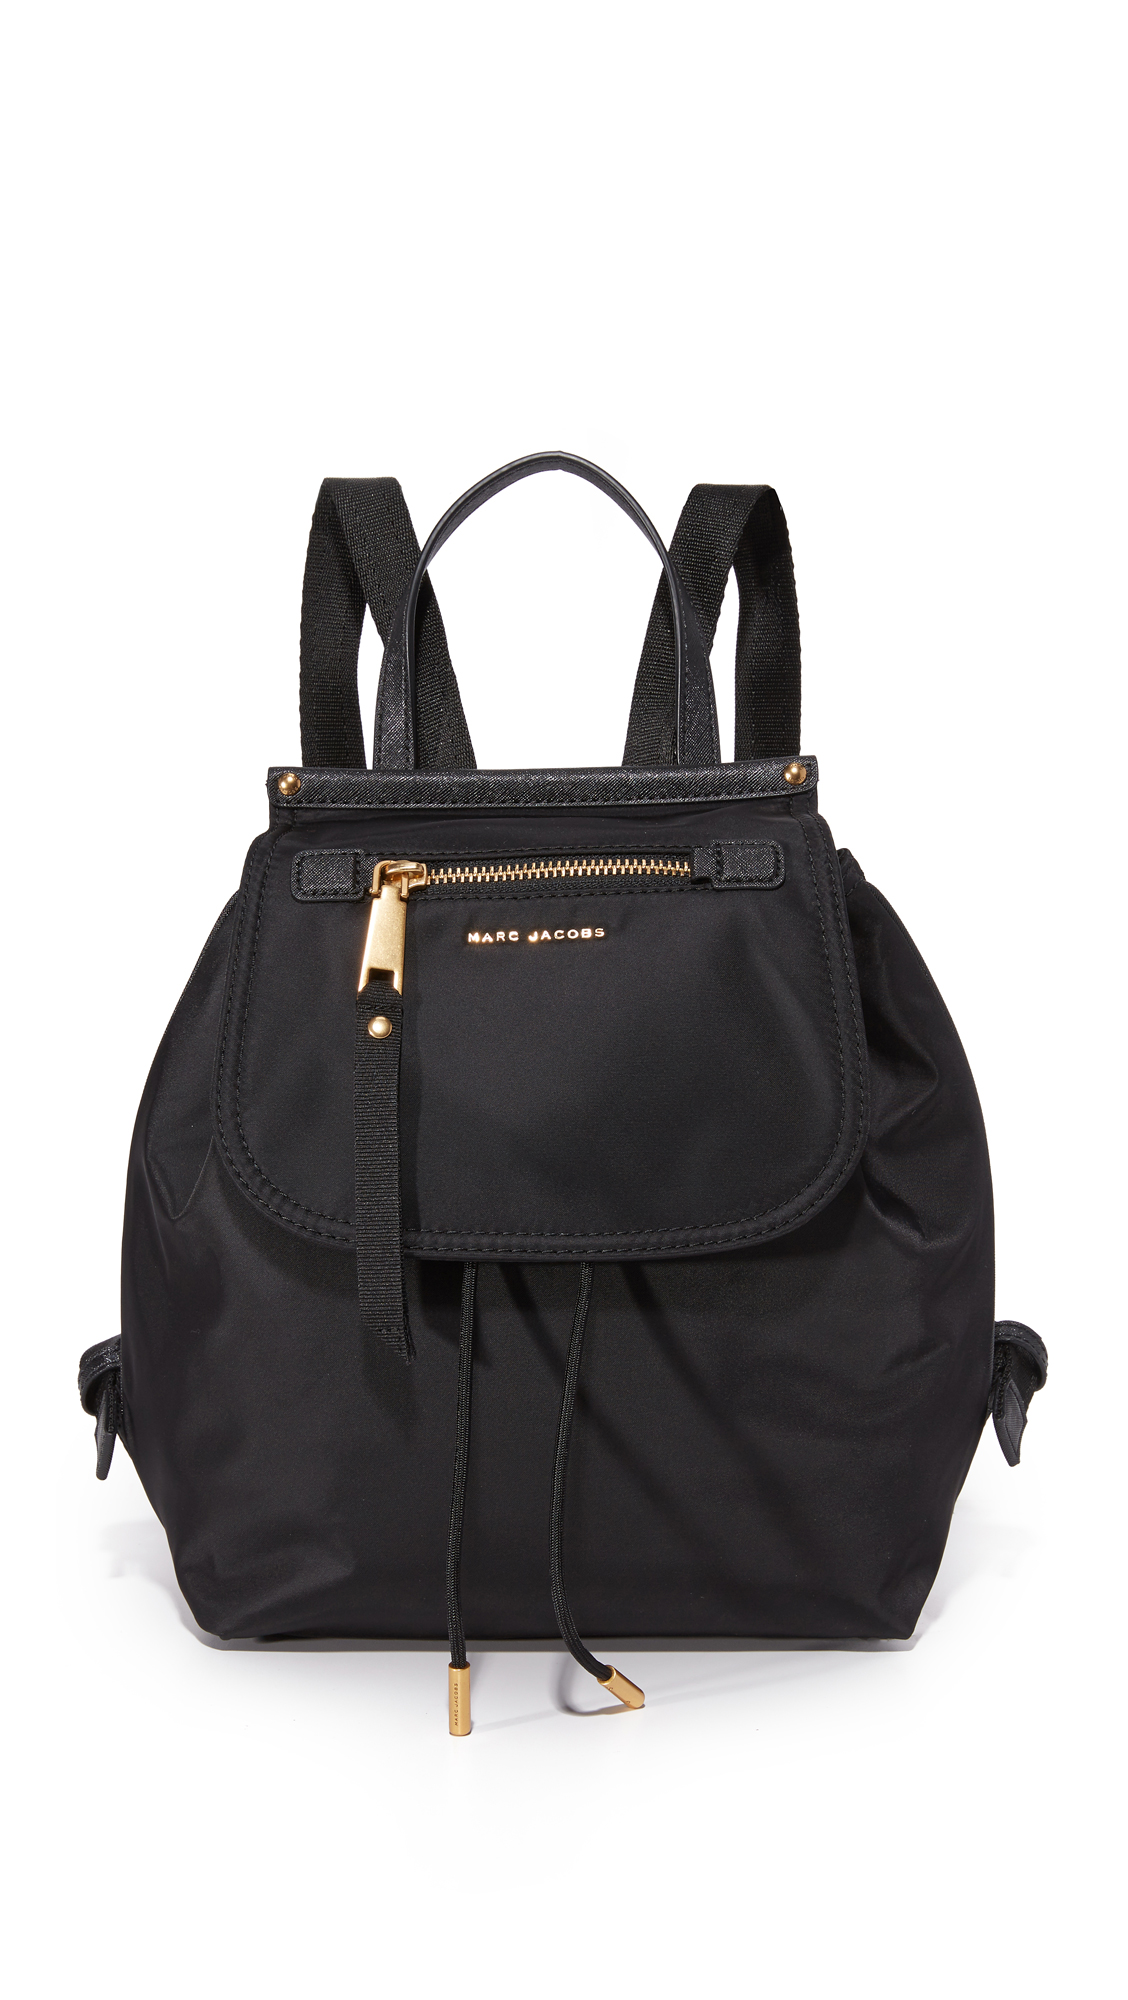 Marc Jacobs Trooper Backpack - Black